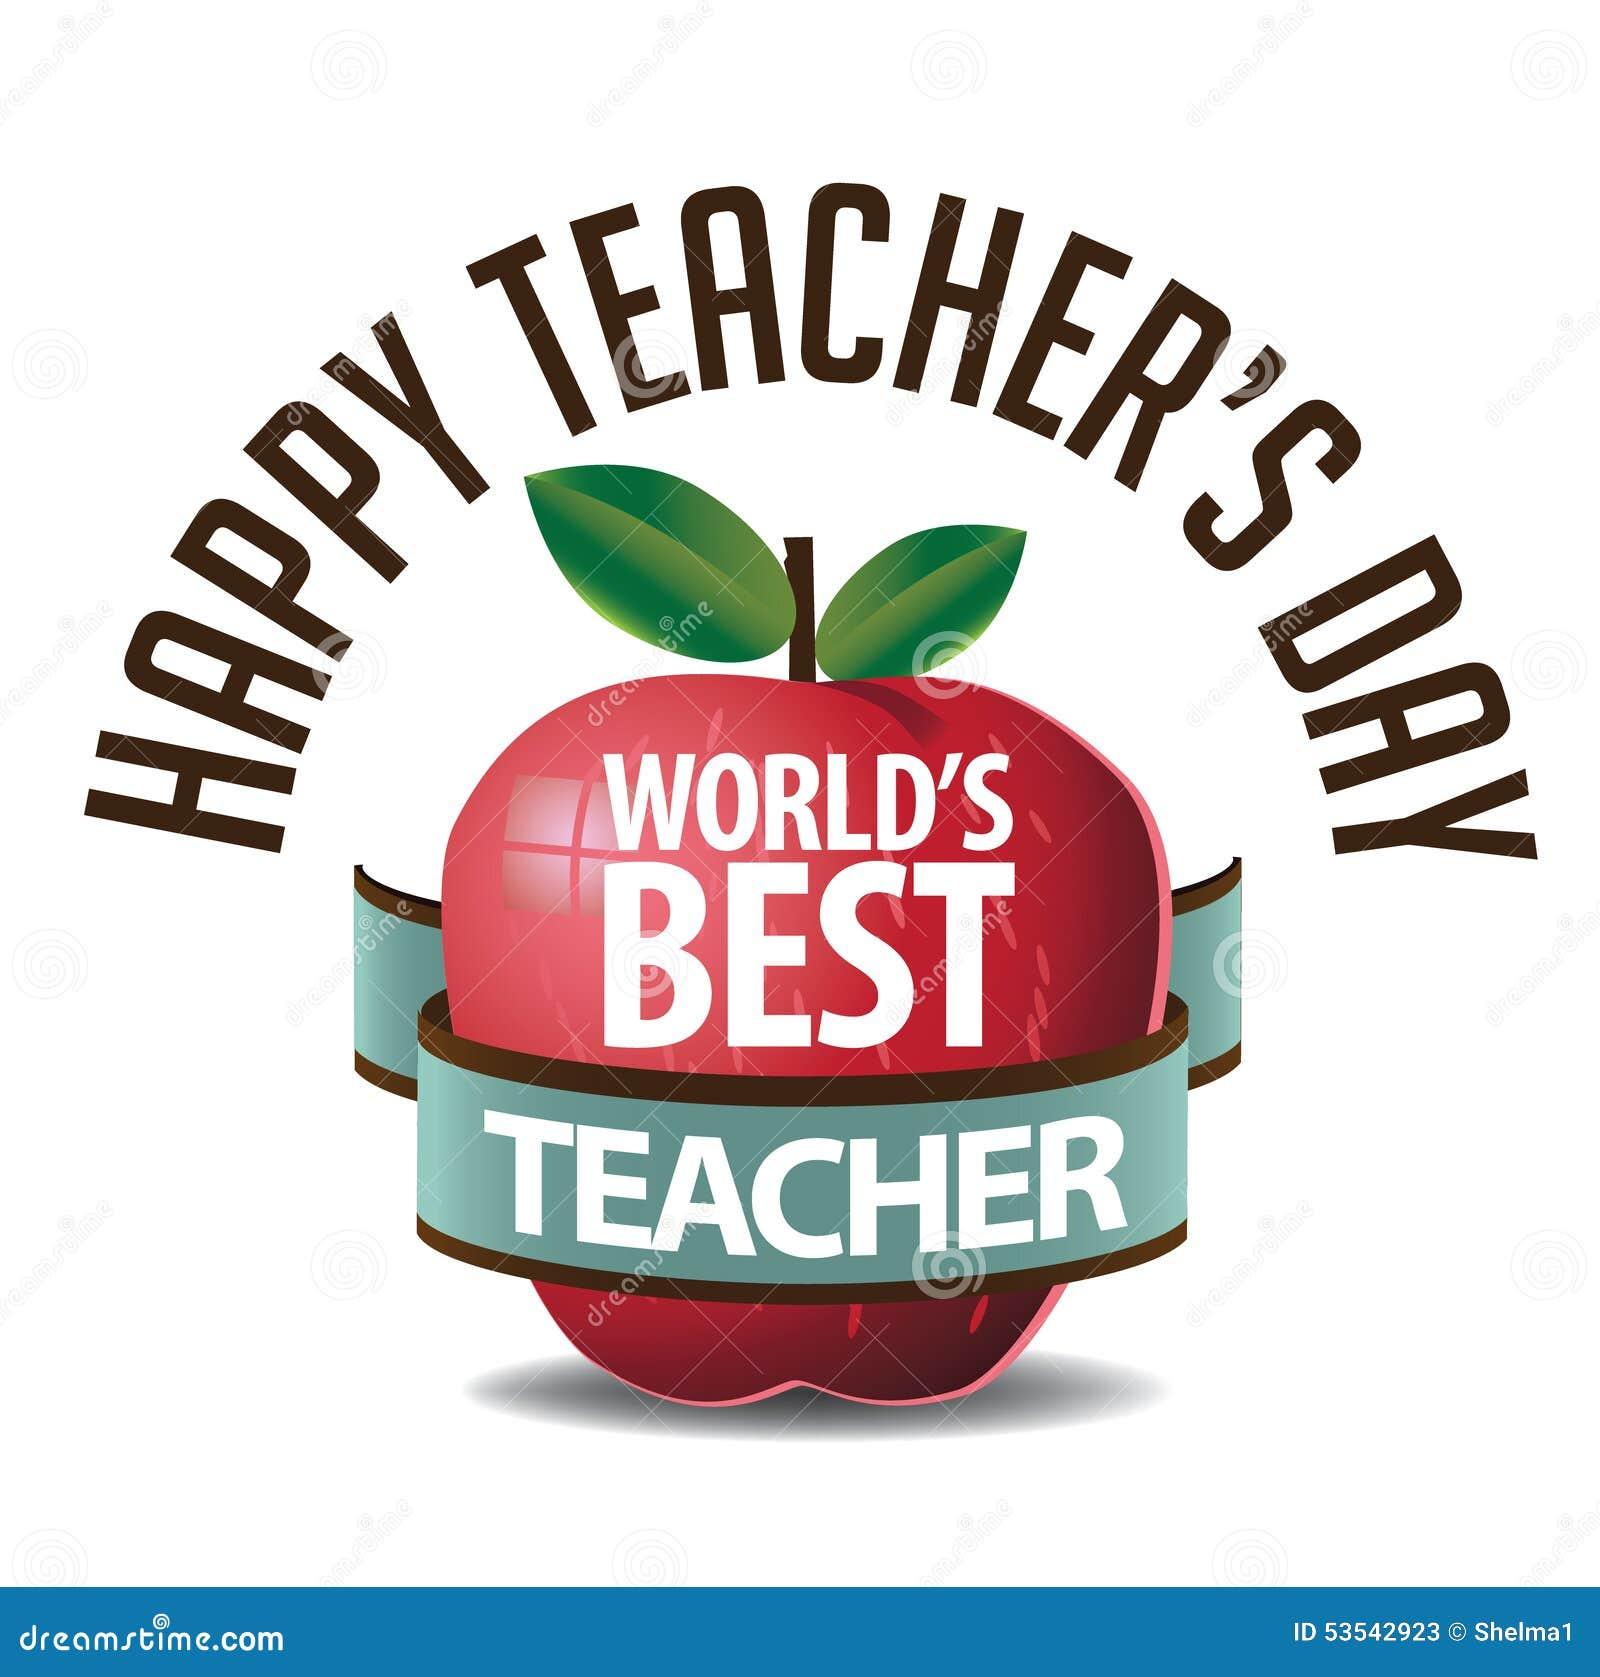 Teachers day icon eps 10 vector stock vector illustration of free teachers day icon eps 10 vector free calendar kristyandbryce Images